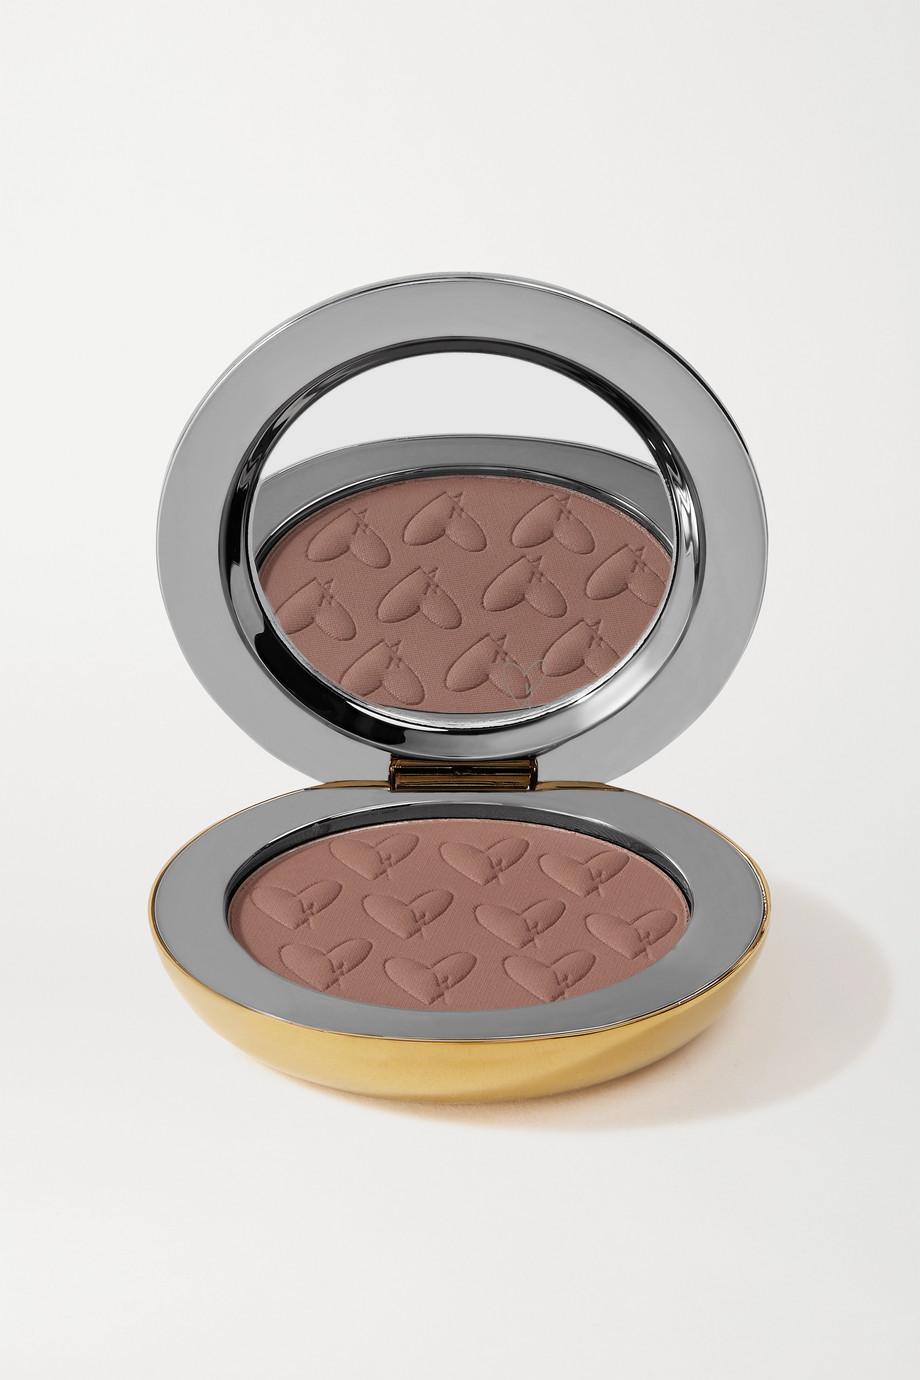 Westman Atelier Beauty Butter Powder Bronzer - Soleil Riche